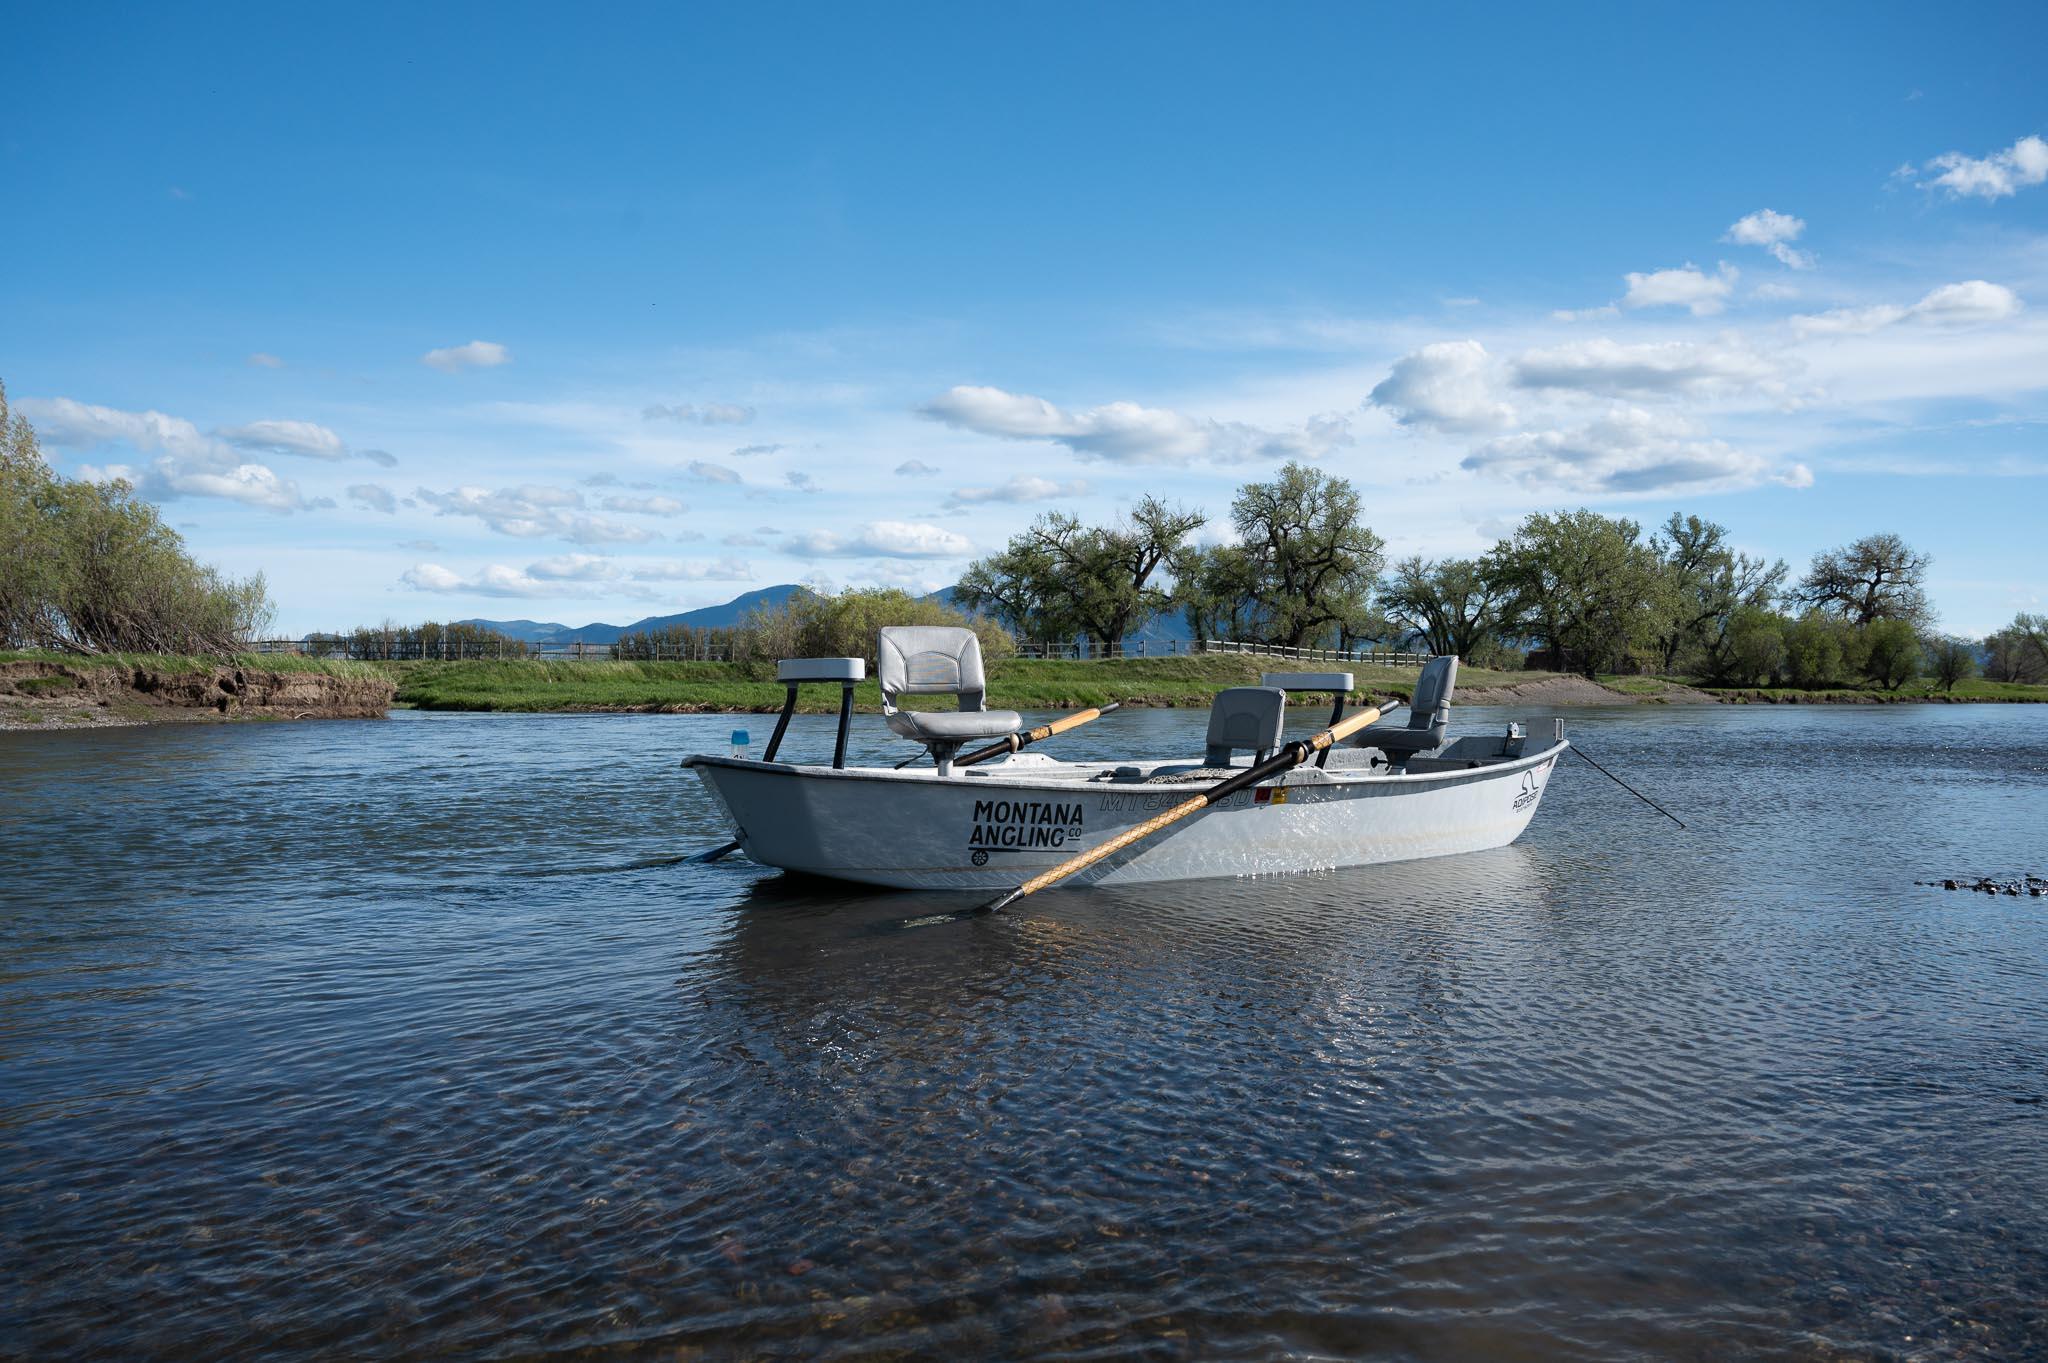 Drift Boat Fly fishing on Montana's Missouri River